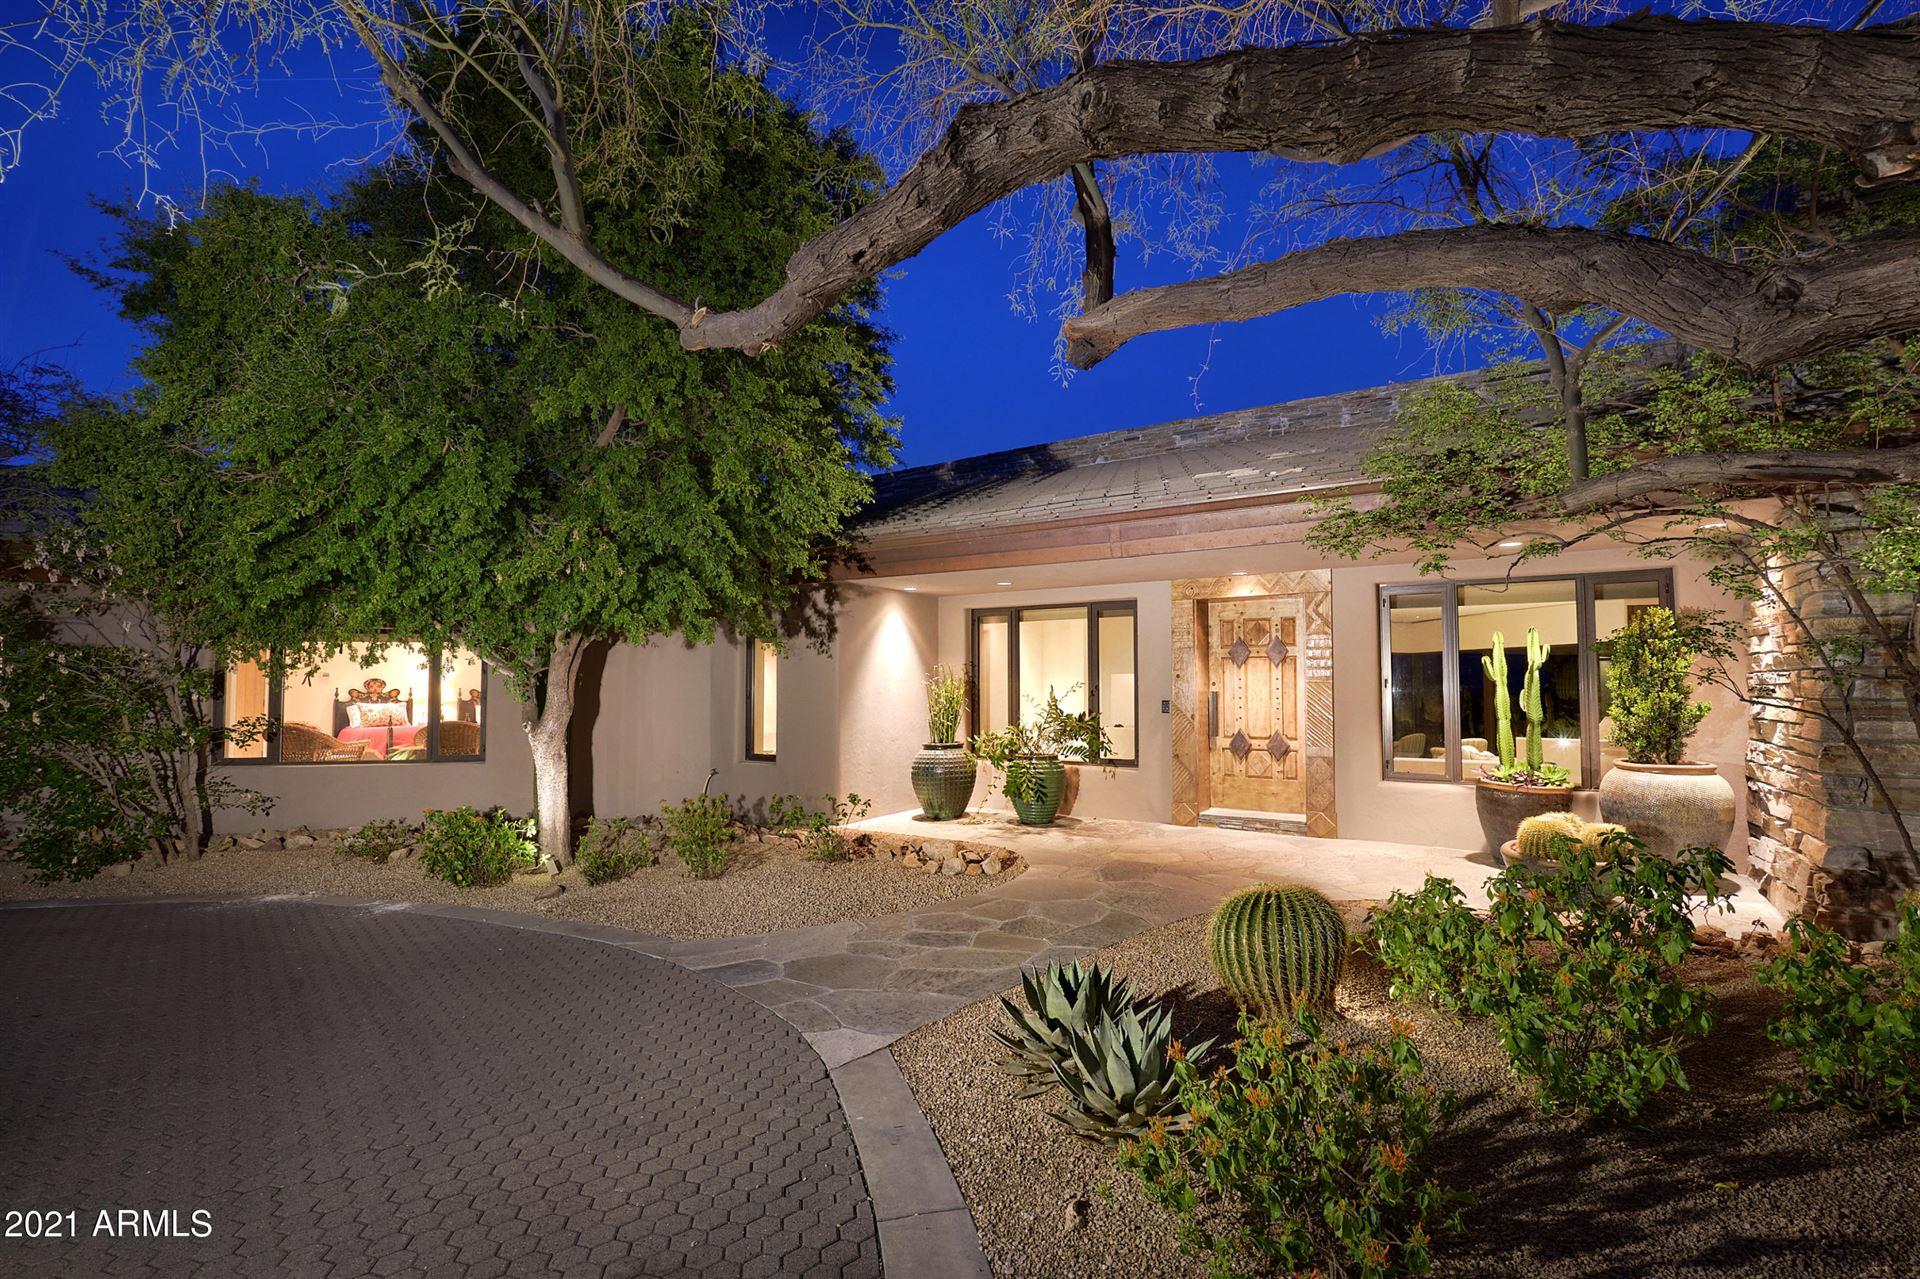 Photo of 6901 E Restin Road, Carefree, AZ 85377 (MLS # 6200909)